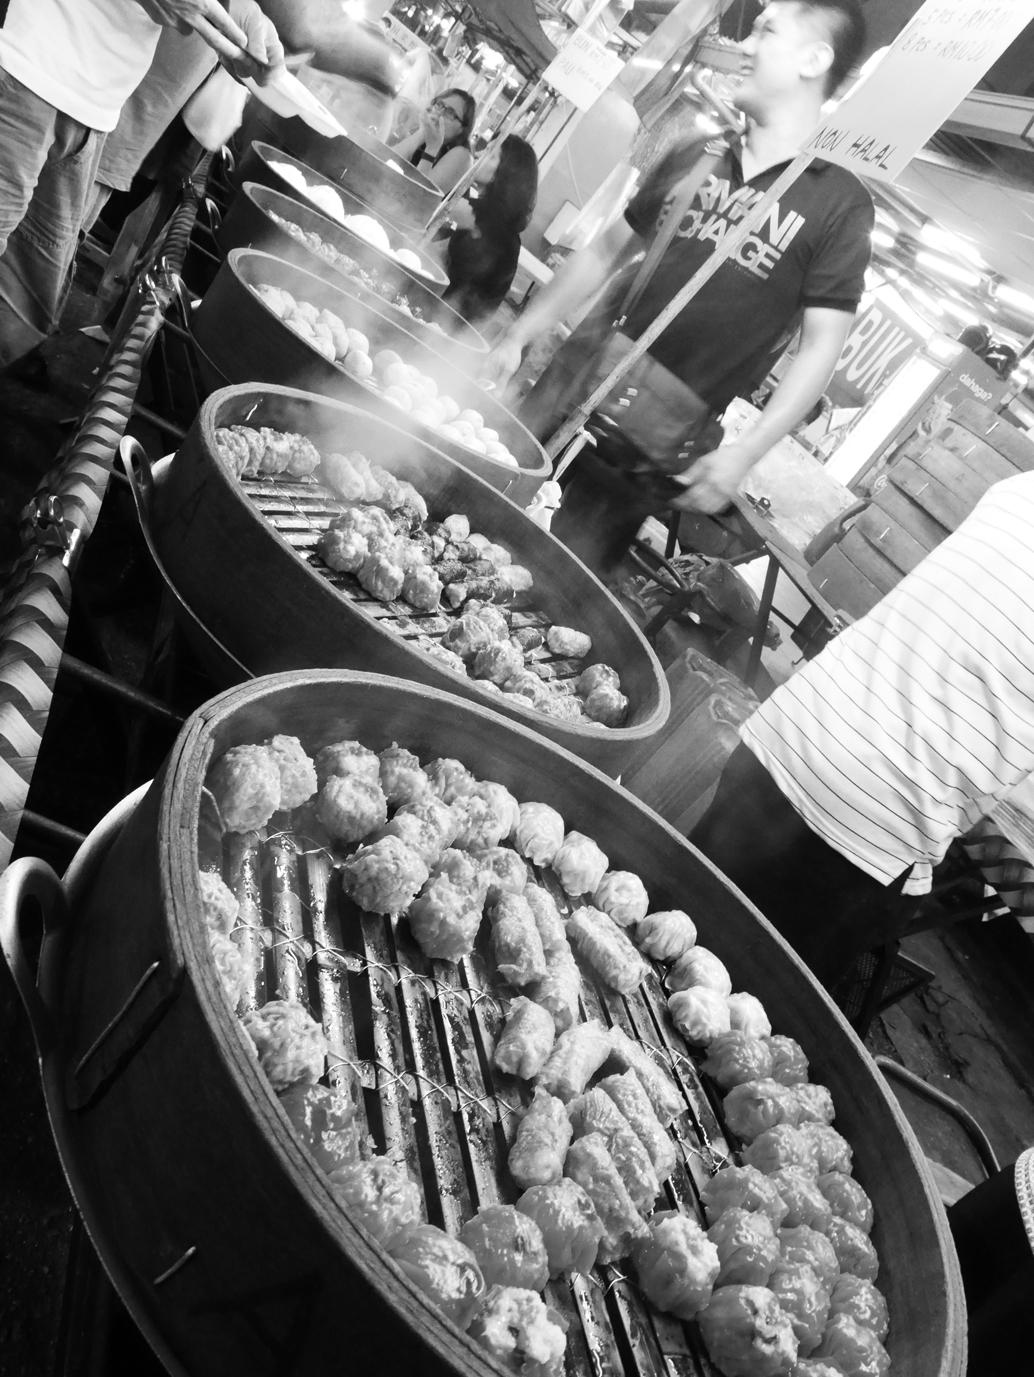 KL-street-food02.jpg